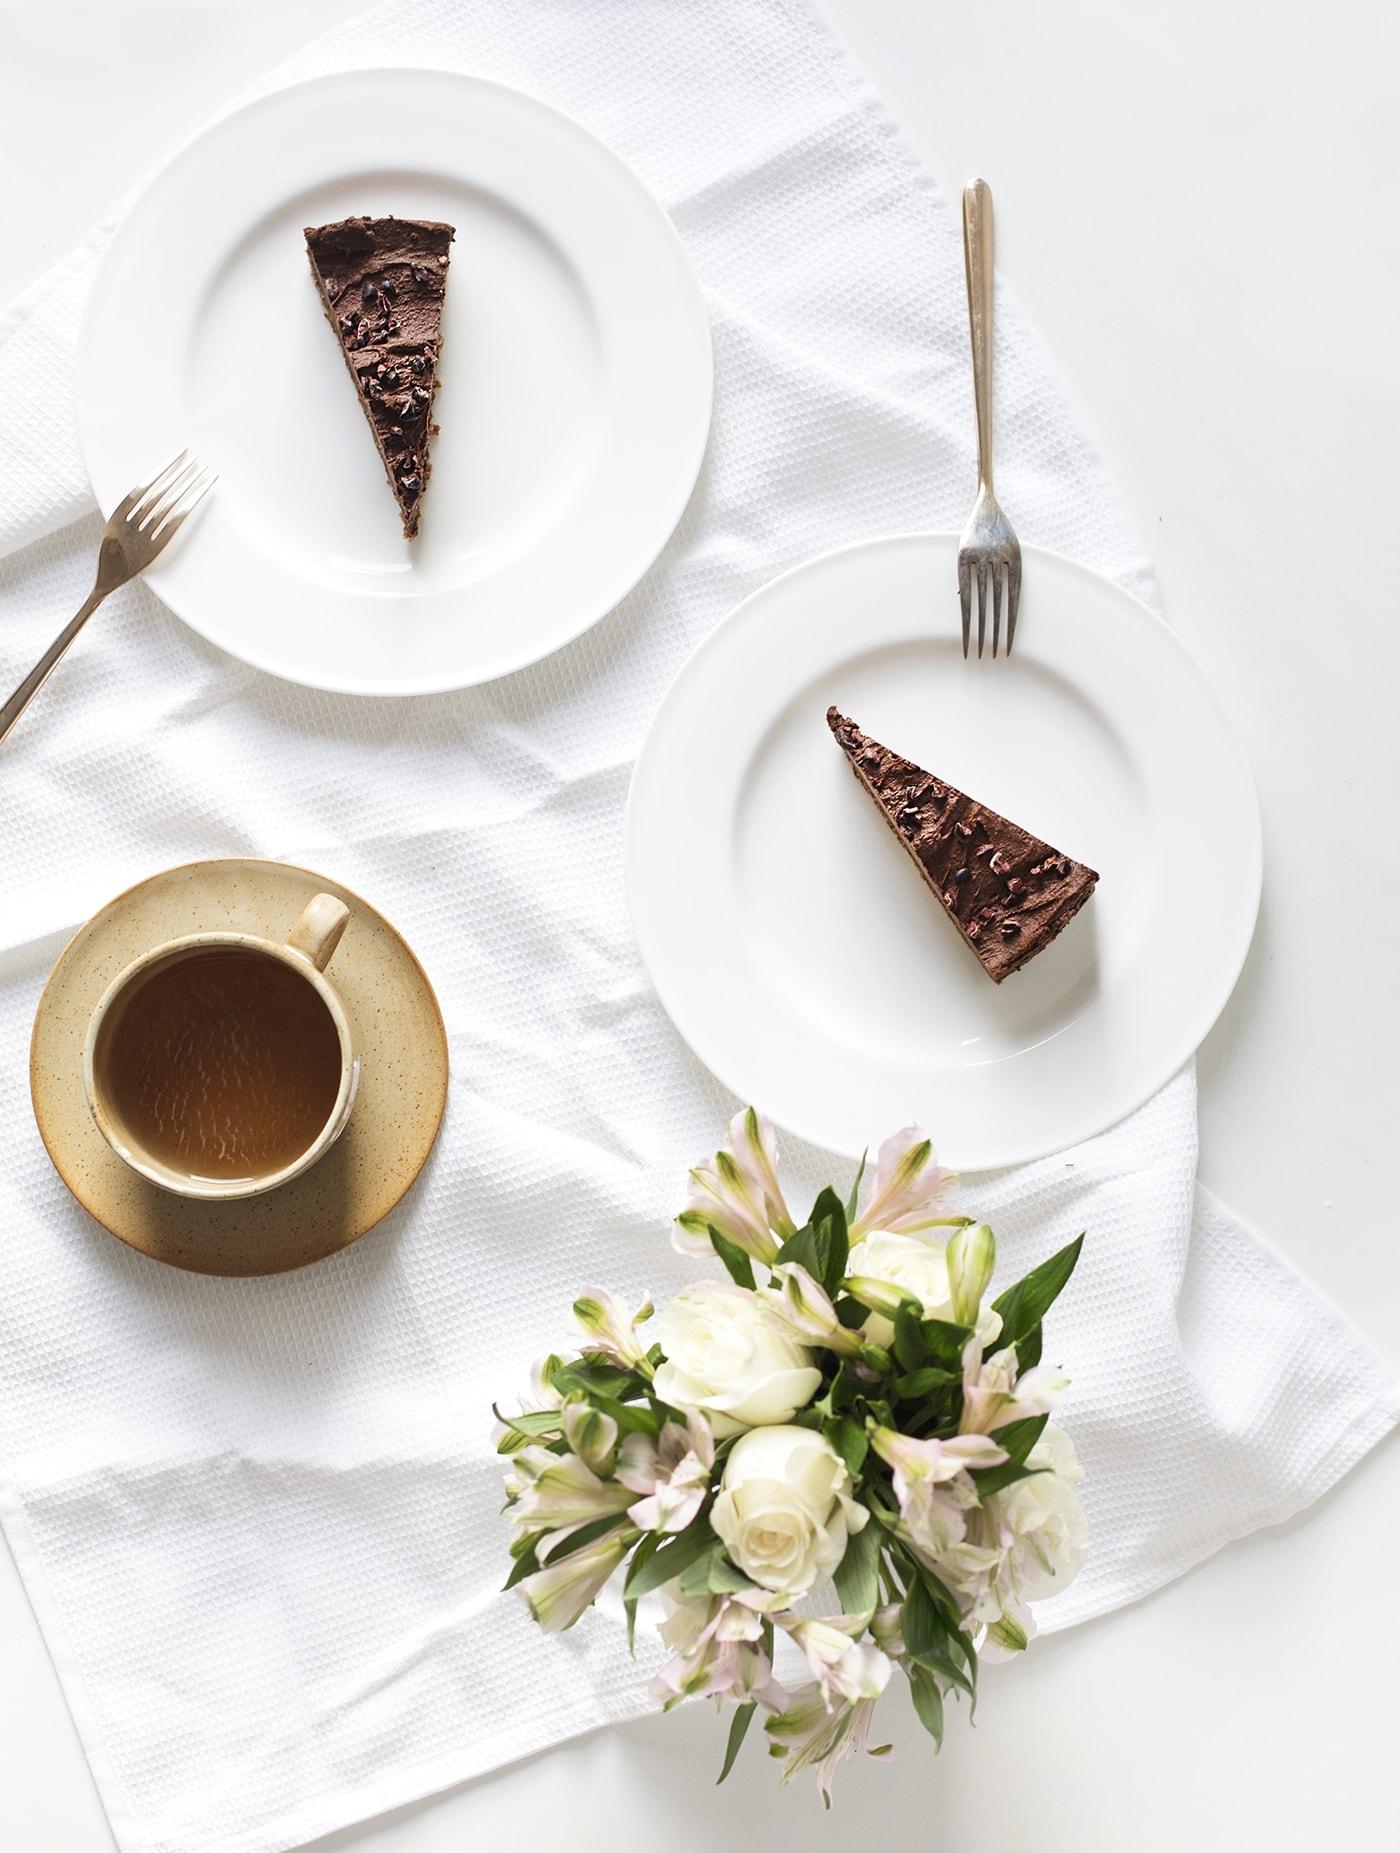 raw-avocado-chocolate-tart-recipe-paleo-dessert-gluten-free-dairy-free-healthier-puddings-perfect-for-making-ahead